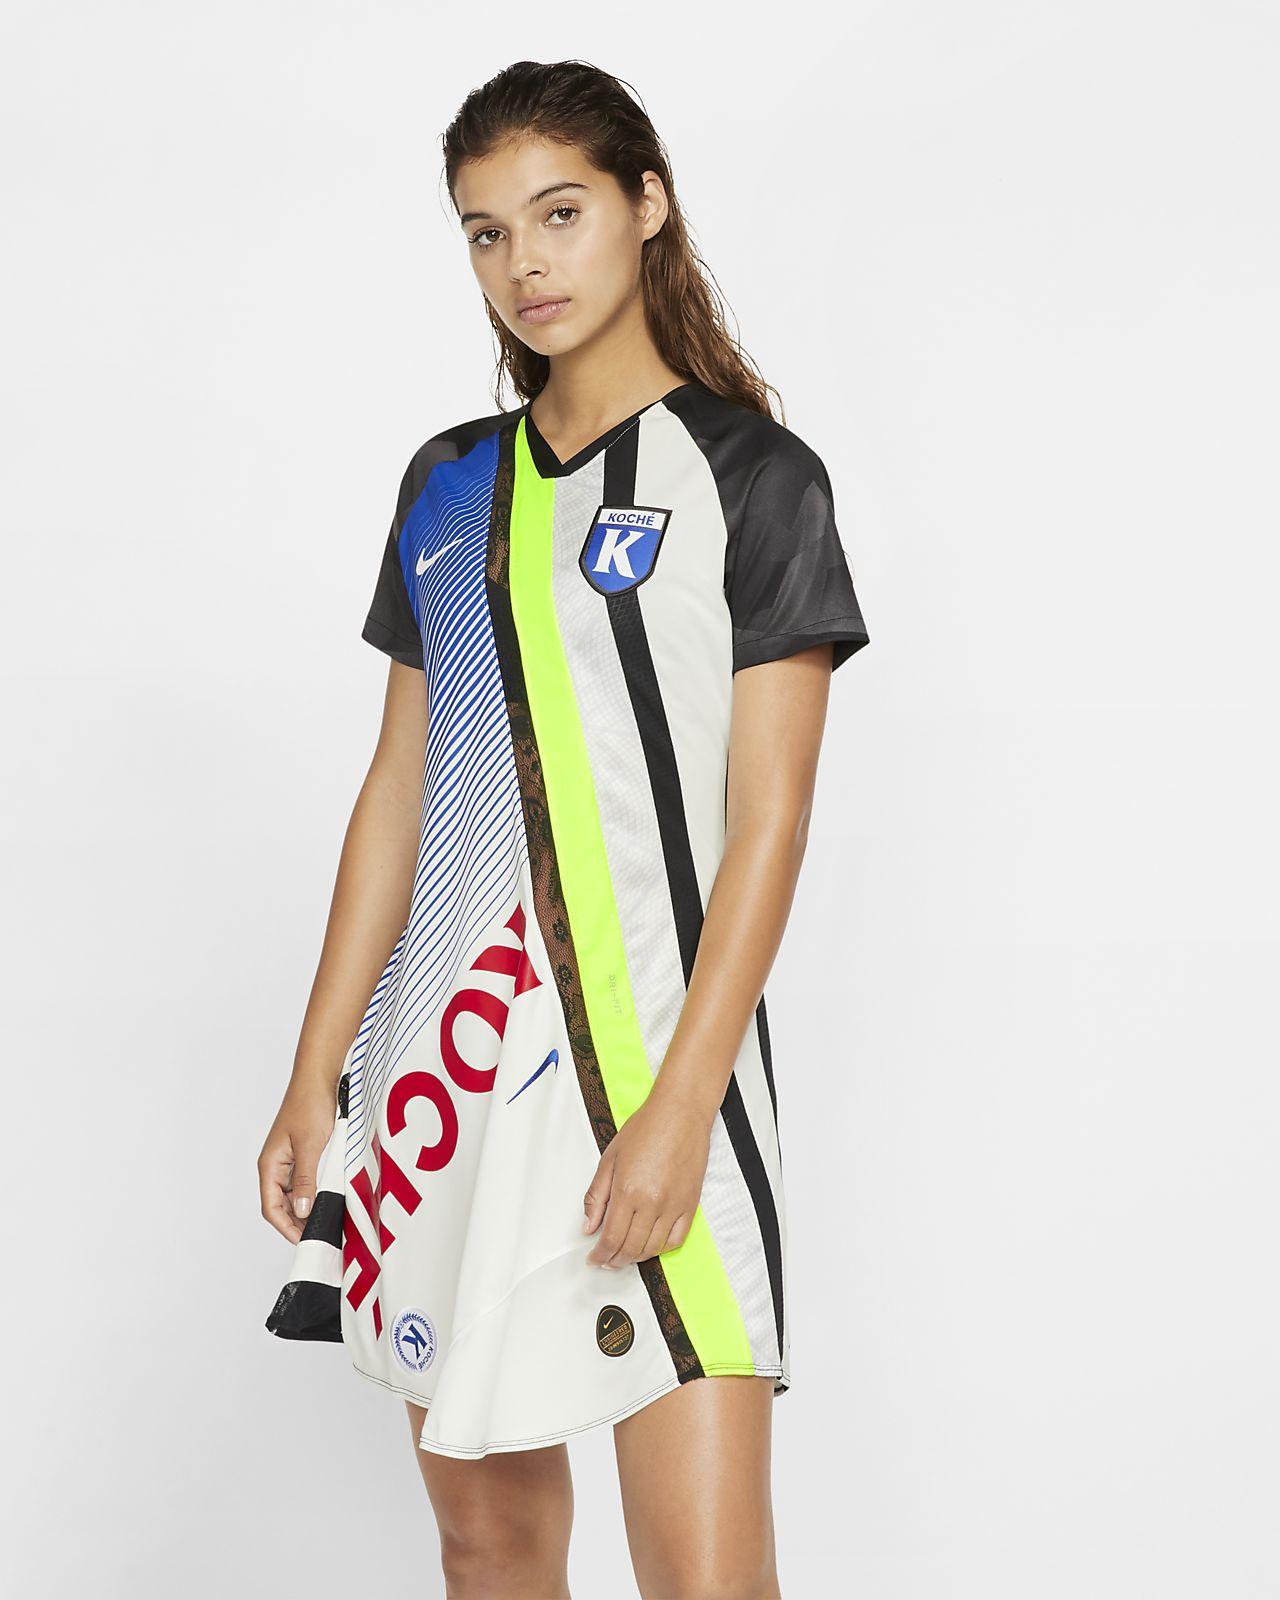 Nike x Koche női ruha